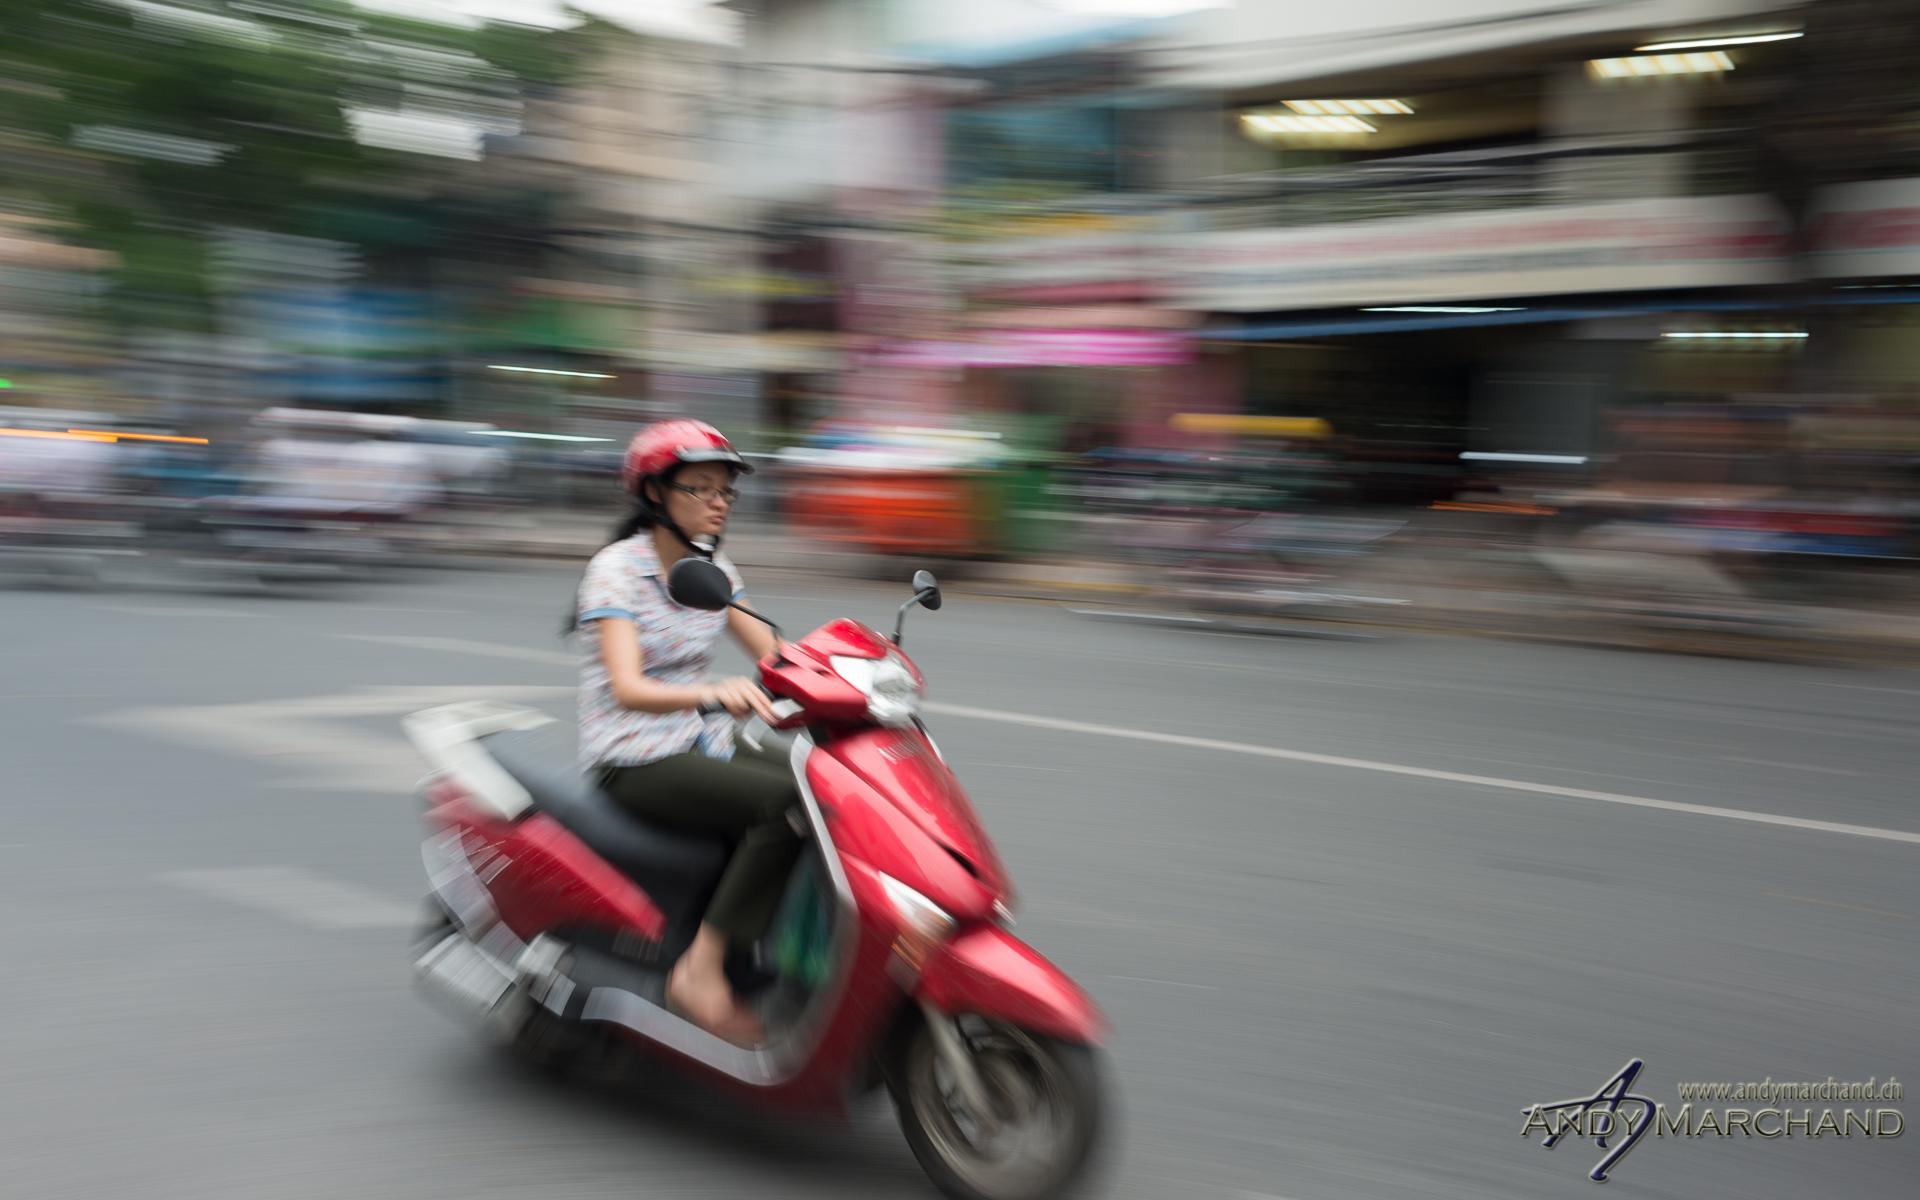 traffic09.jpg